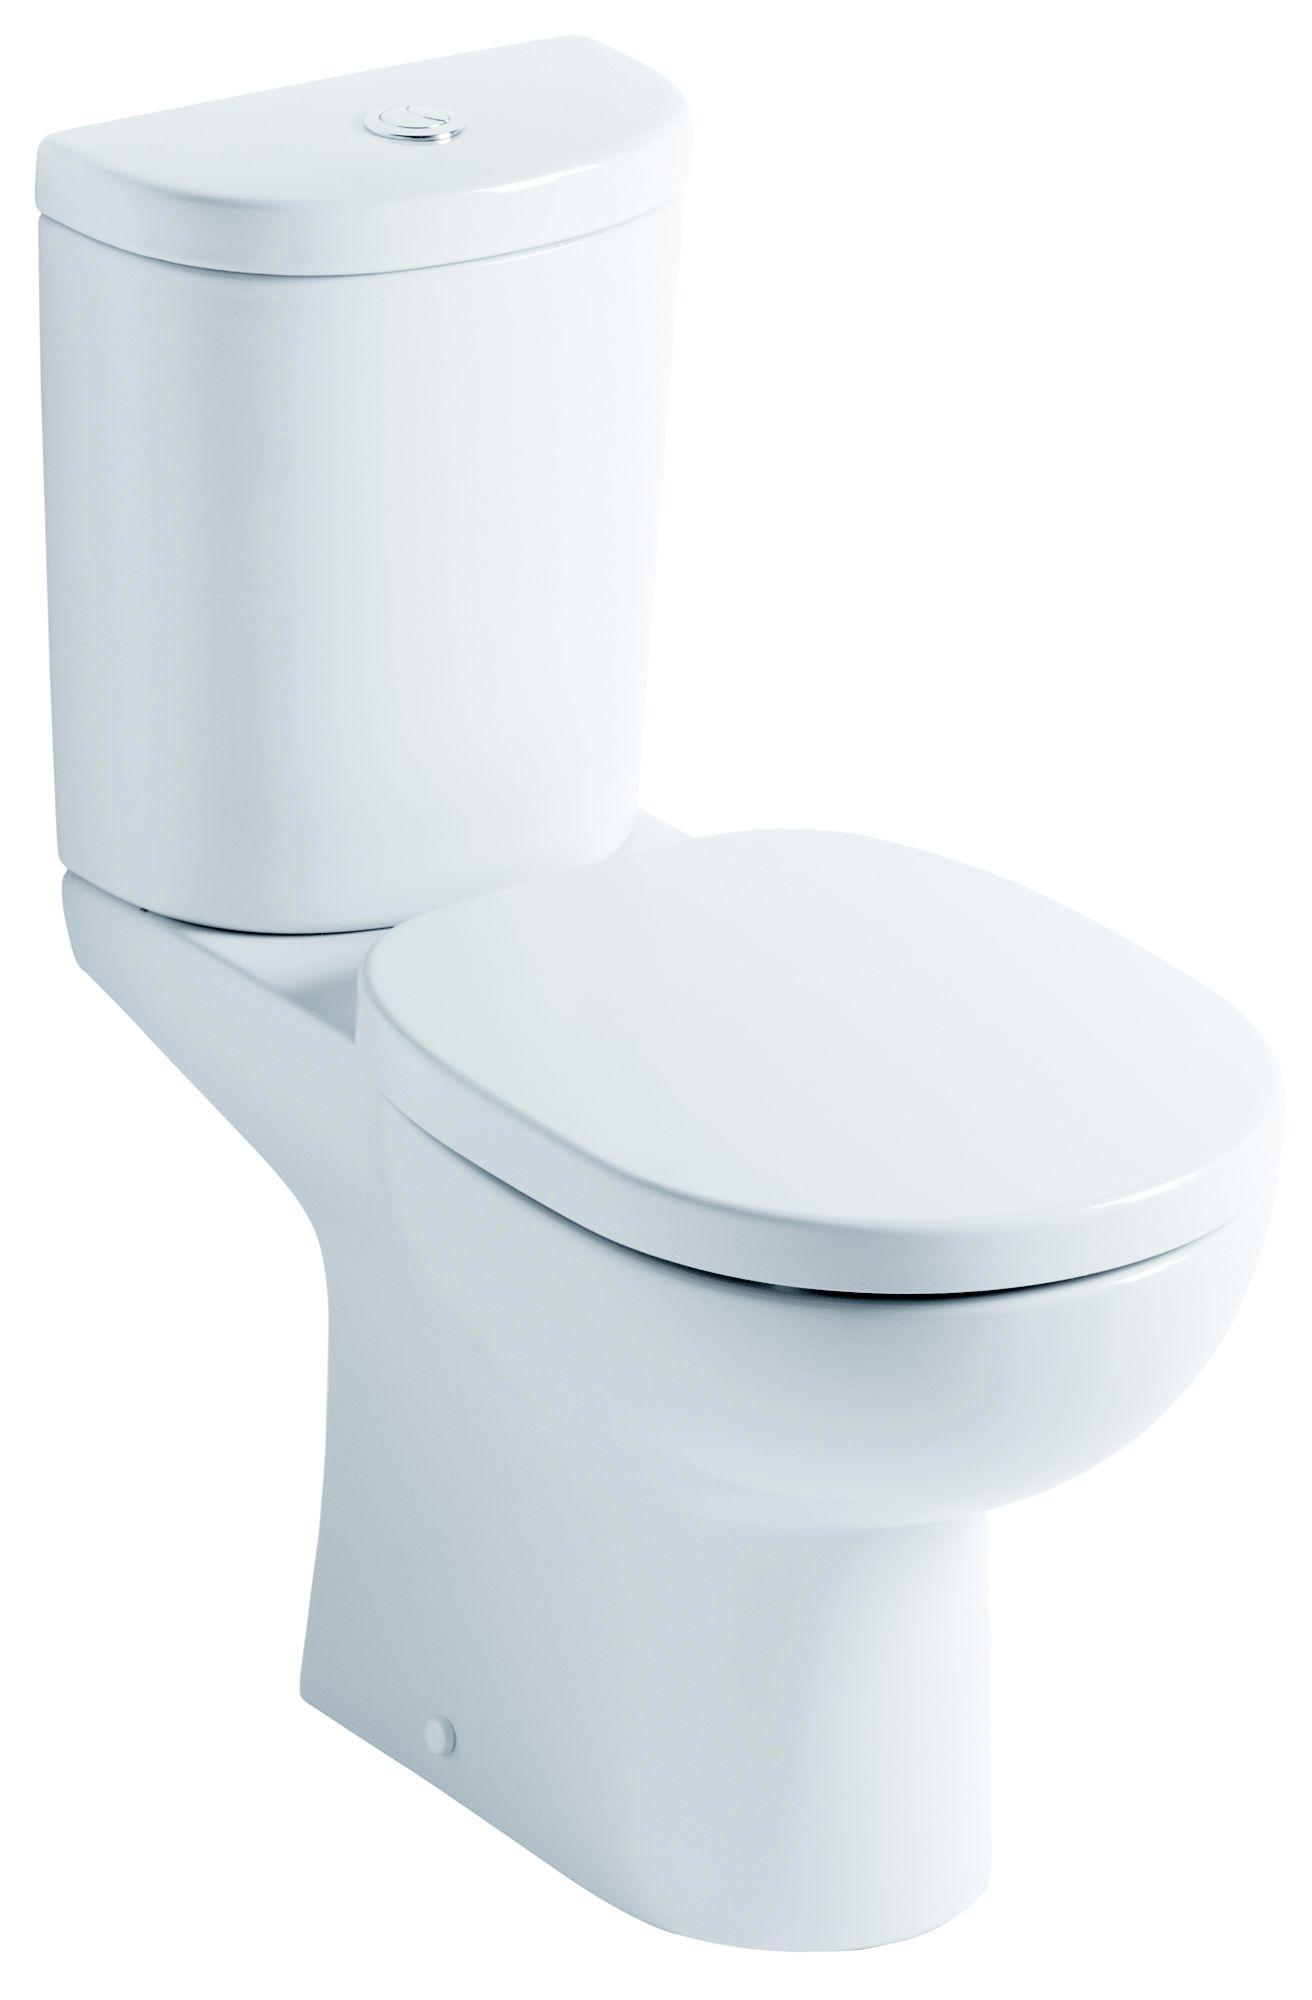 Remarkable Ideal Standard Senses Close Coupled Toilet With Soft Close Seat Departments Diy At Bq Creativecarmelina Interior Chair Design Creativecarmelinacom